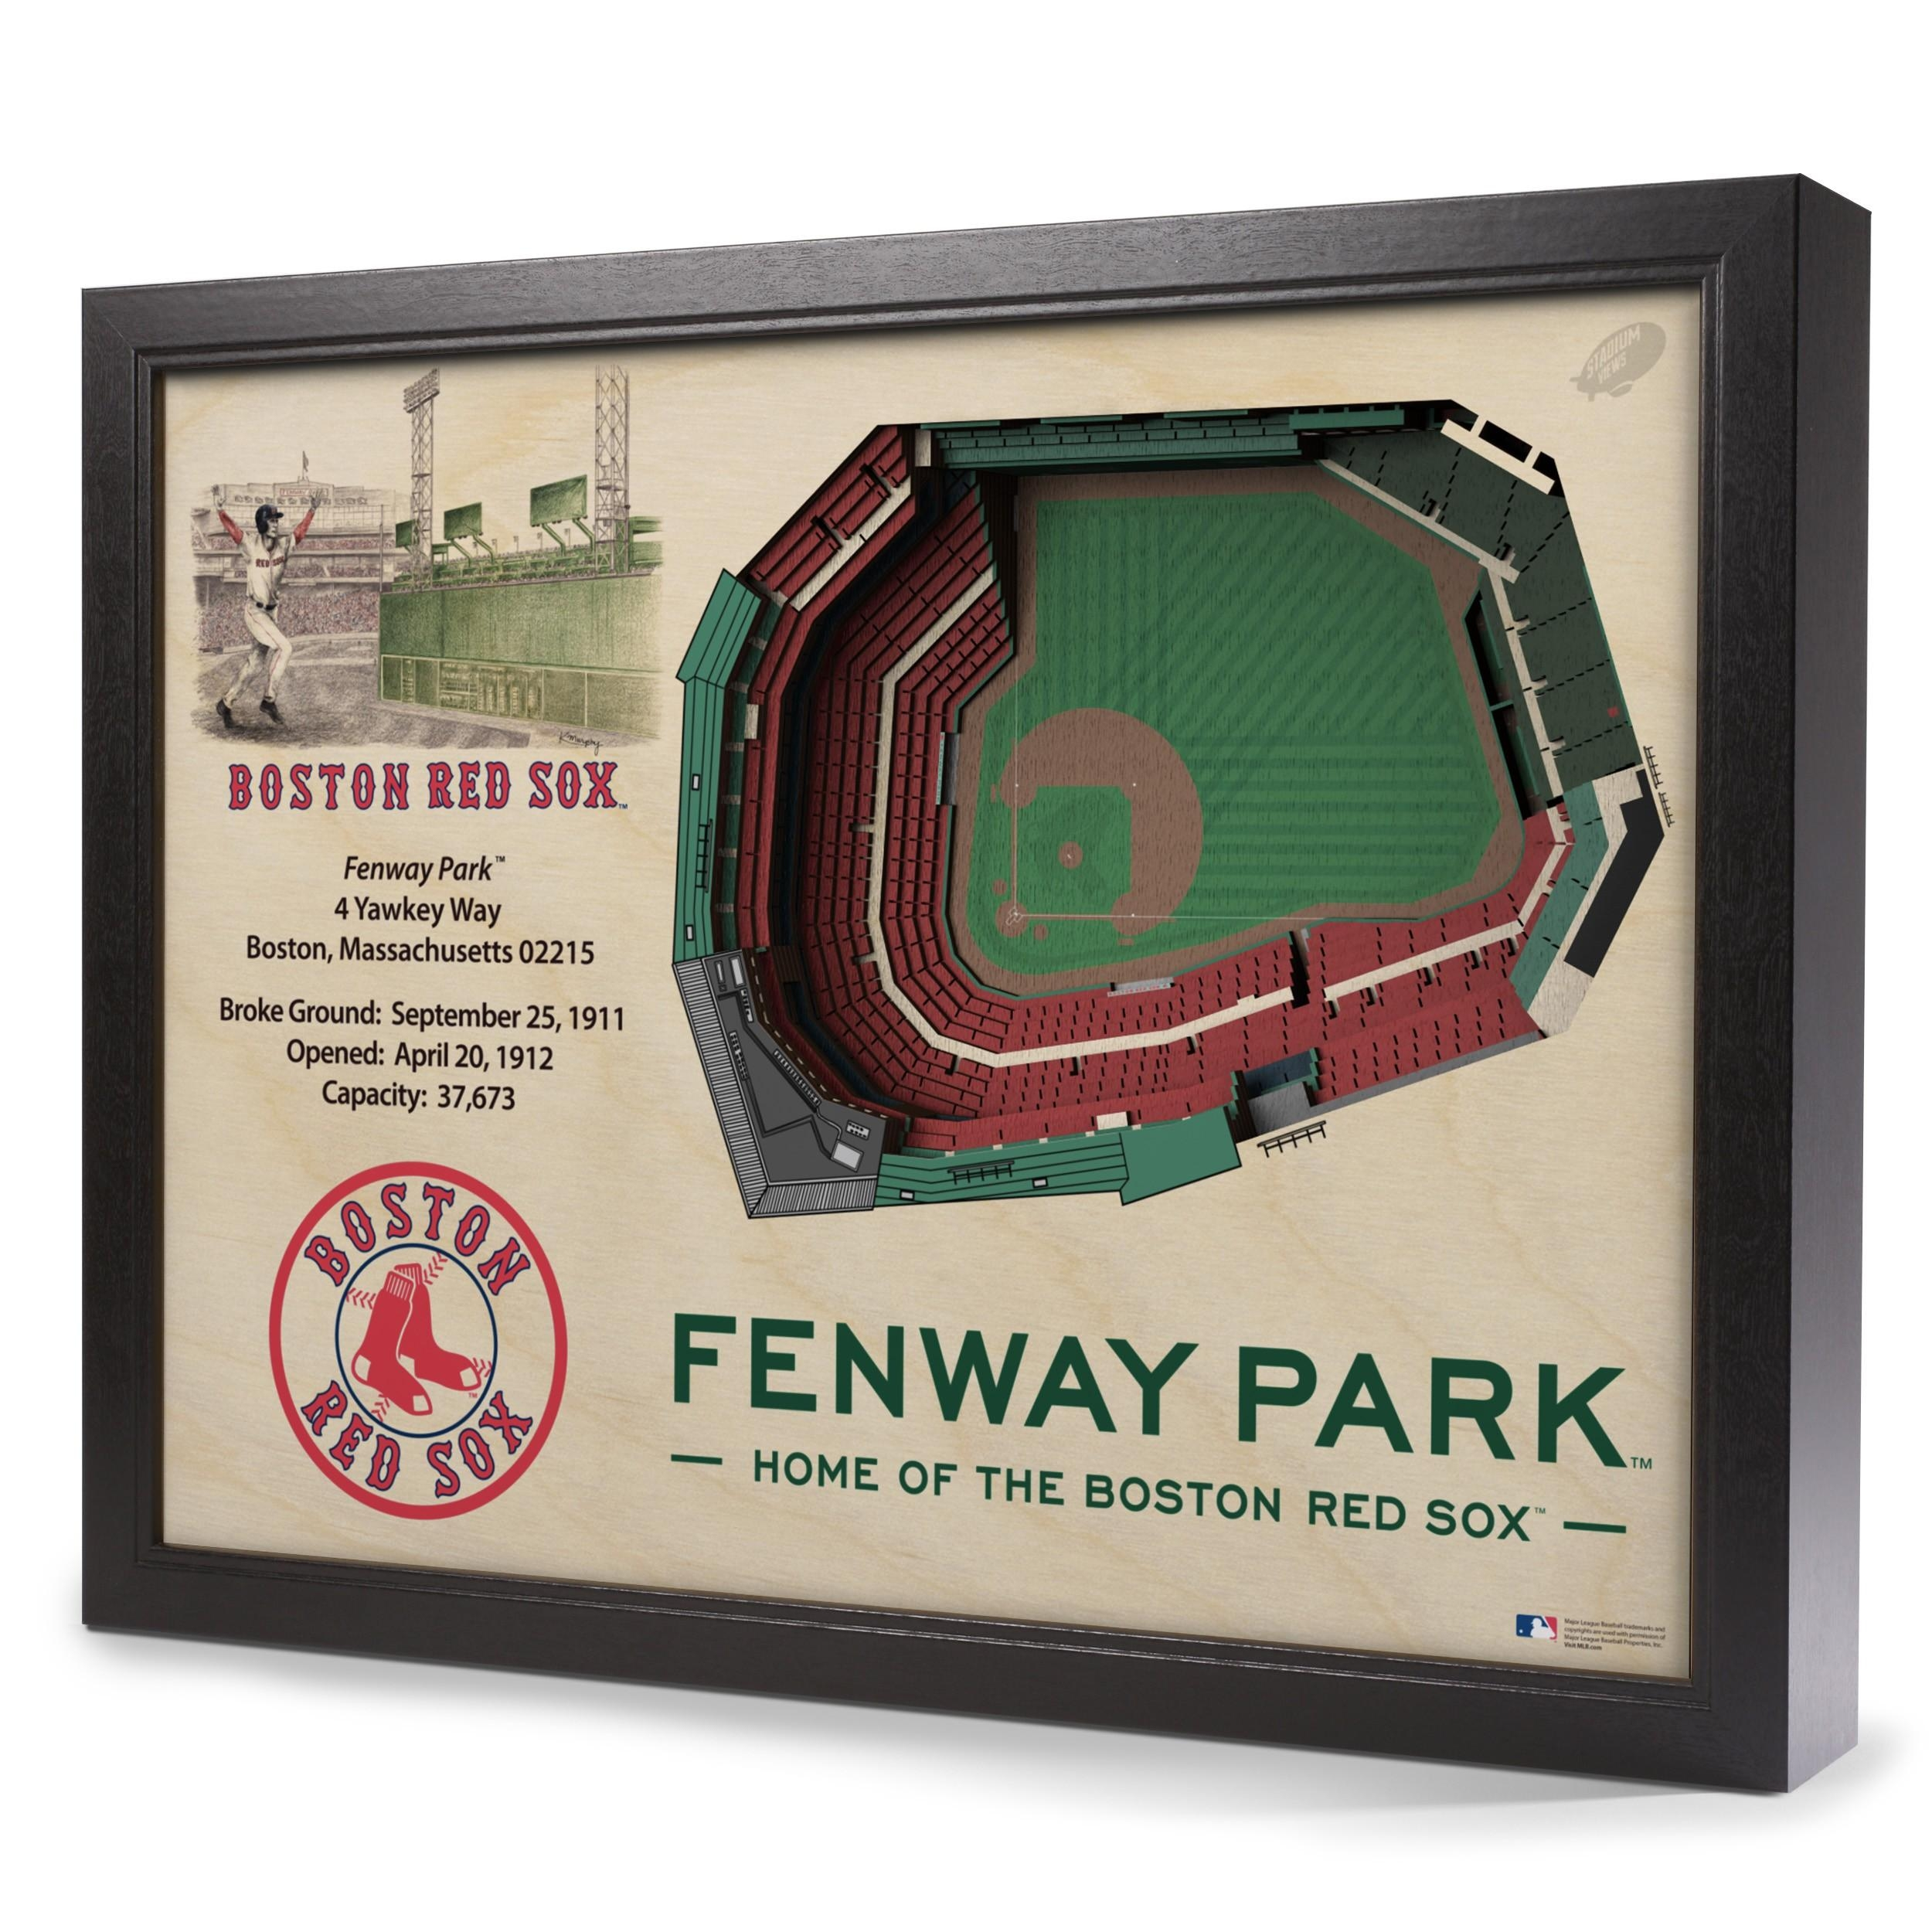 Boston Red Sox Stadiumview Wall Art – Fenway Park 3 D Reproduction Regarding Boston Red Sox Wall Art (Image 9 of 20)